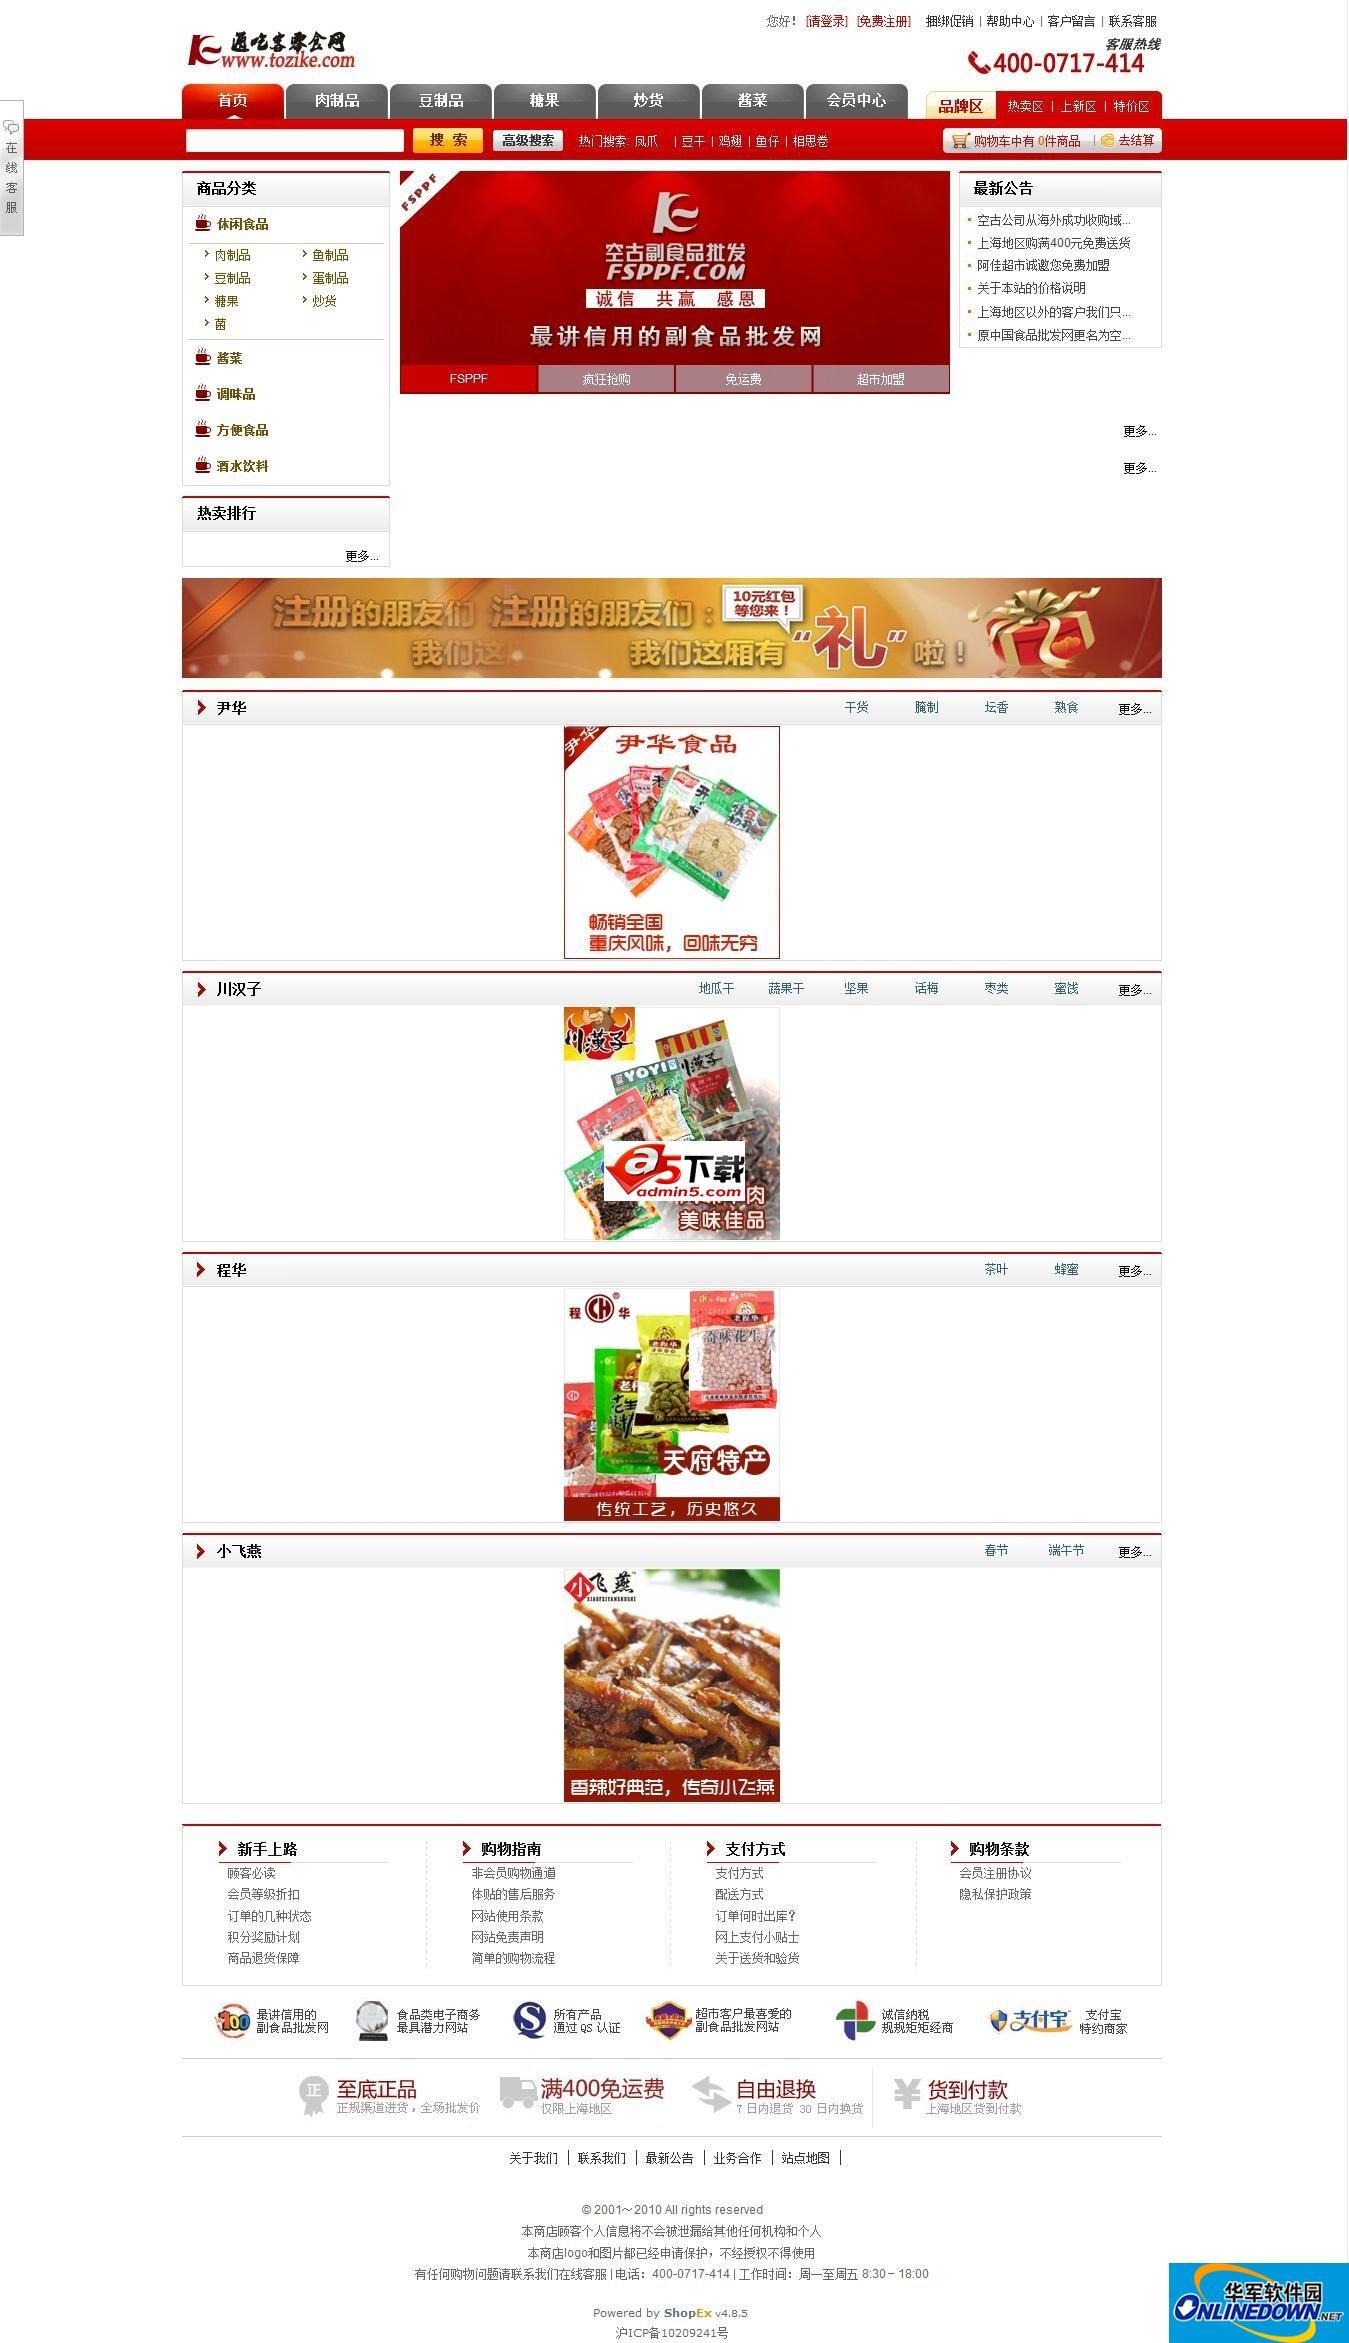 通吃客零食网整站 for Shopex PC版